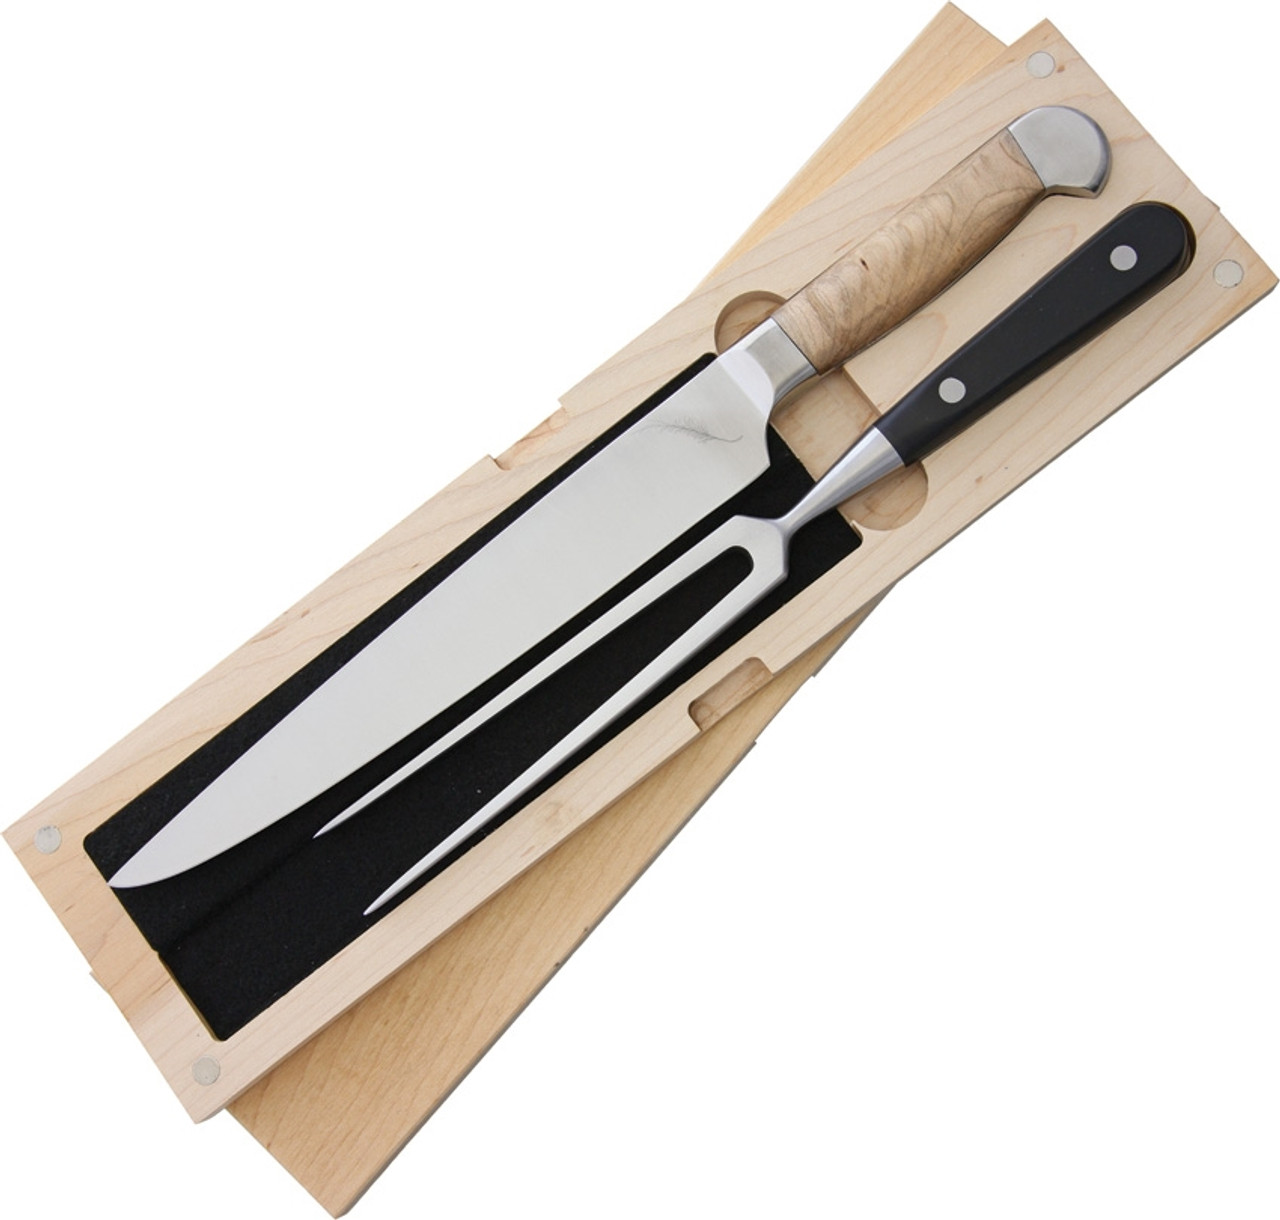 "Ferrum Estate 2pc Carving Set, 13.63"" Length w/9.0"" American Steel Blade, Maple Wood Handle"